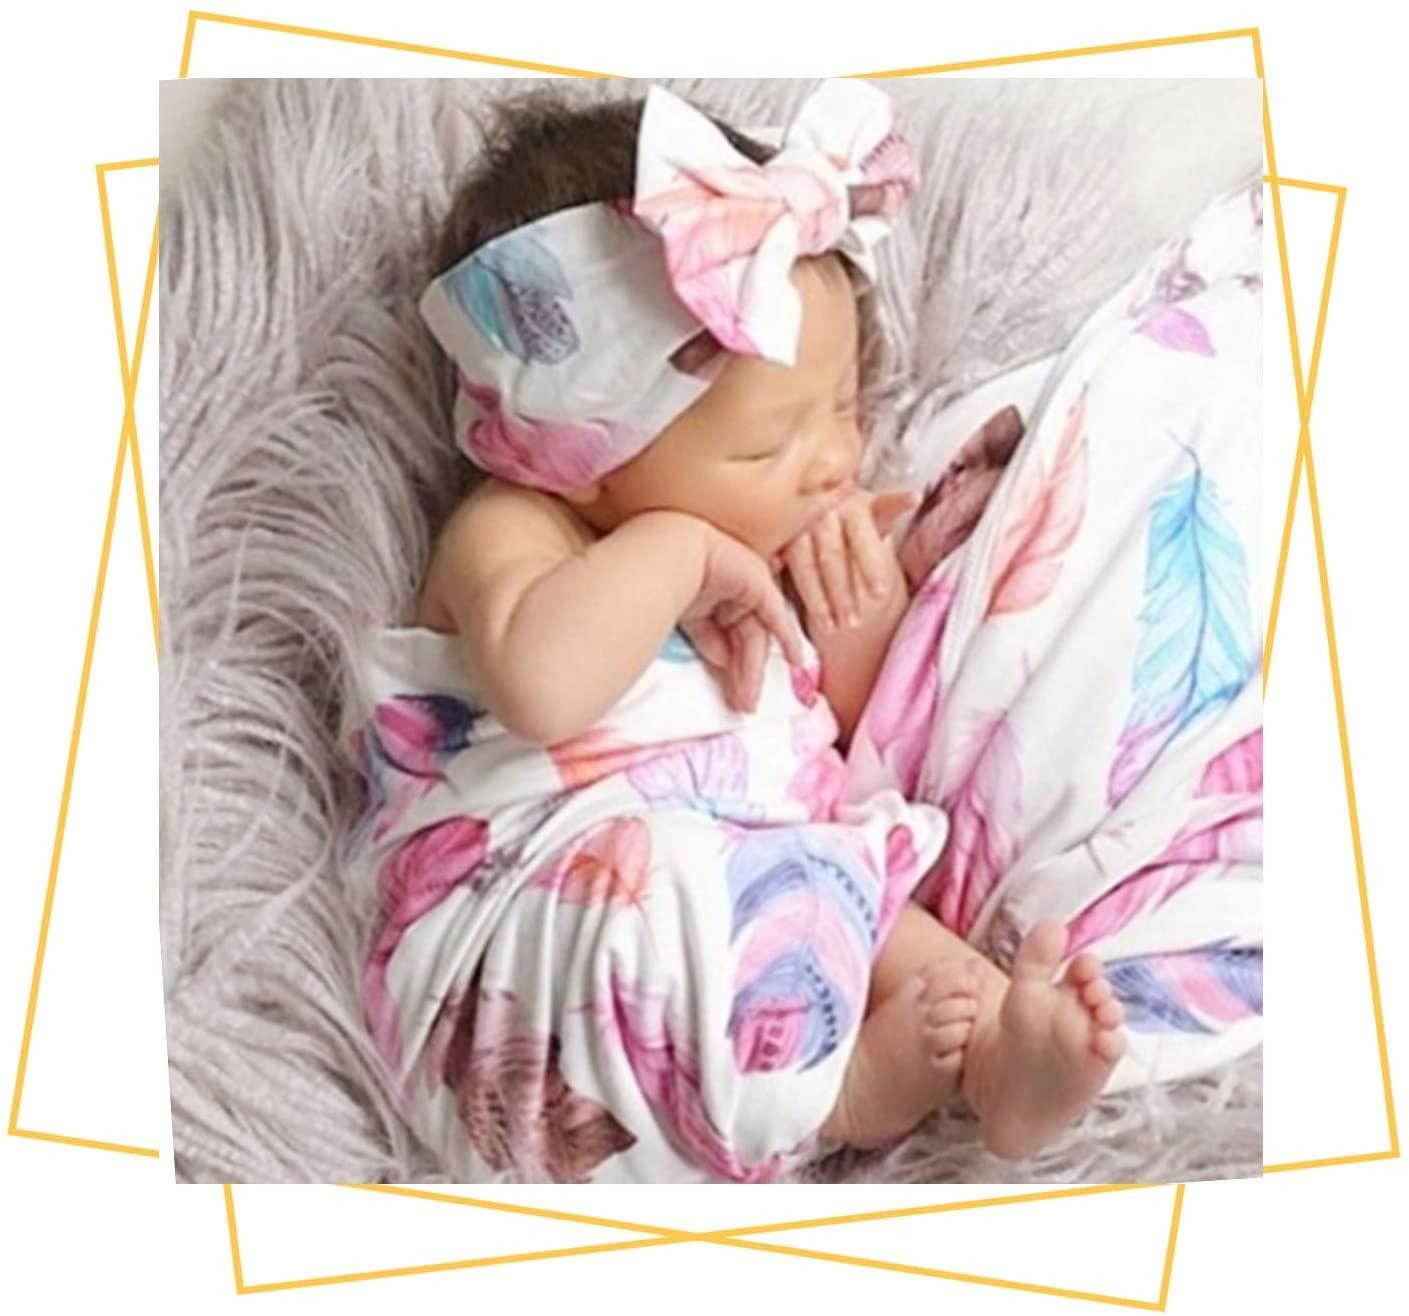 SUFEINI Newborn Receiving Blanket Headband Set - Unisex Soft Baby Swaddle Girl Boy Gifts